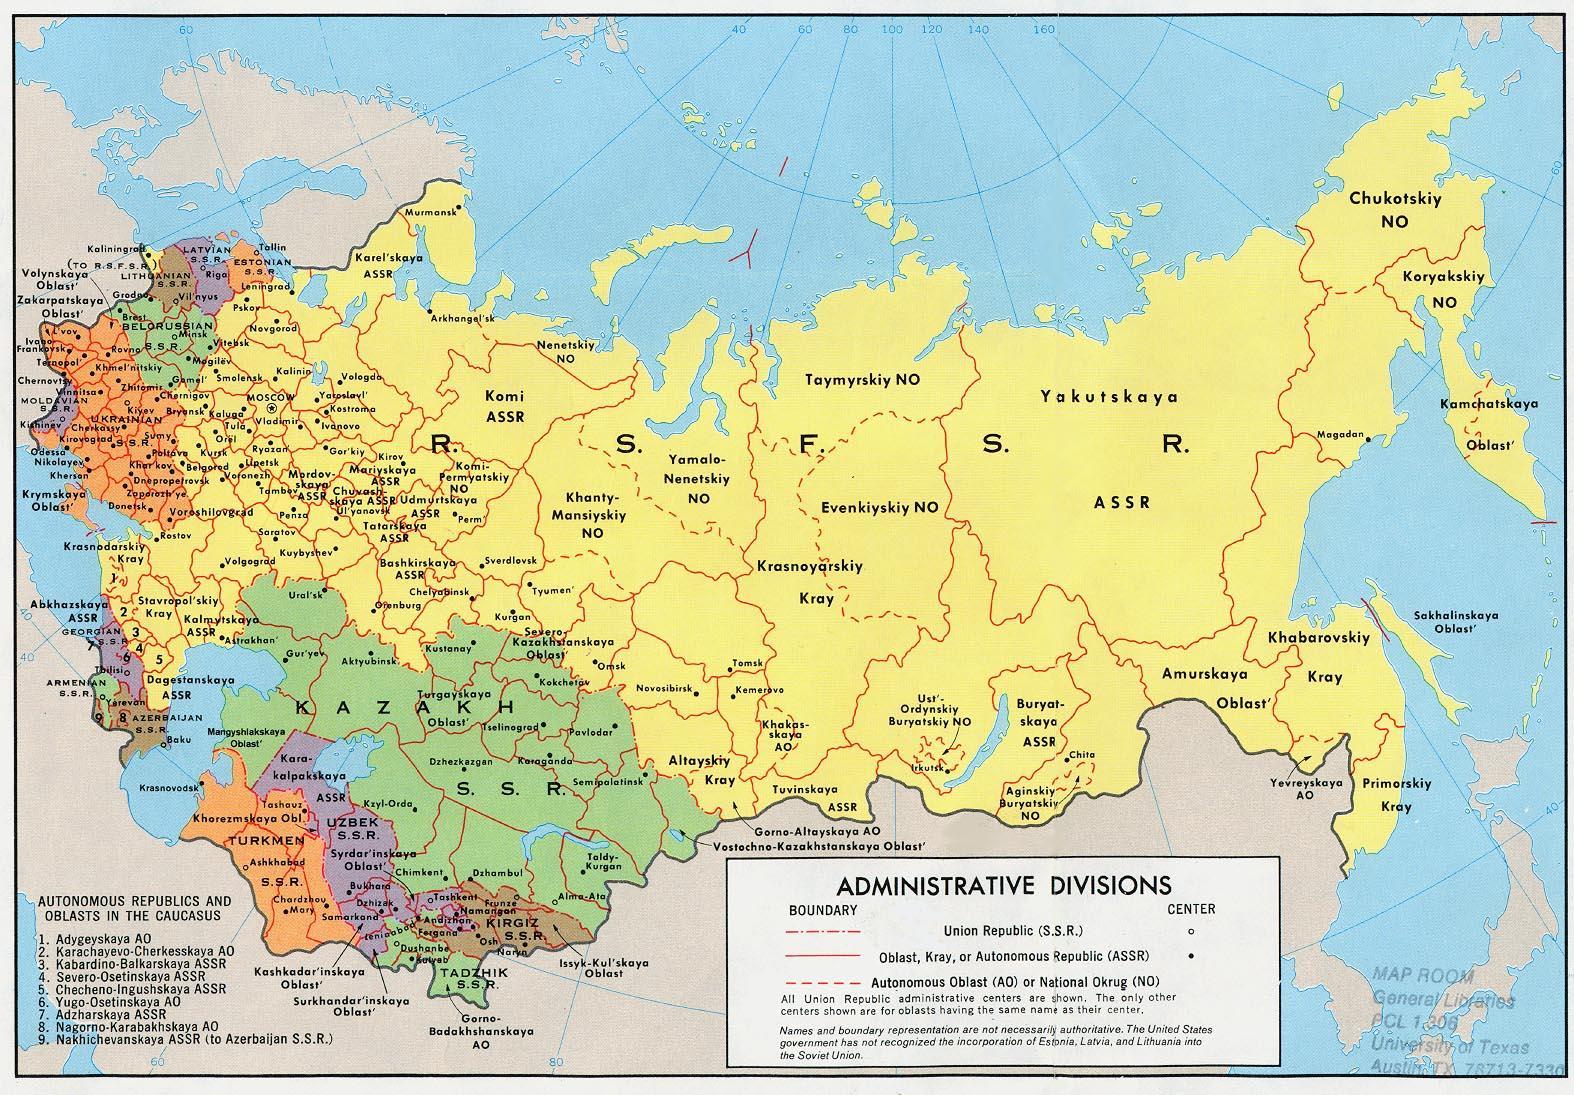 Mapa Sssr Mapa Sssr A Istocne Evrope Evropi